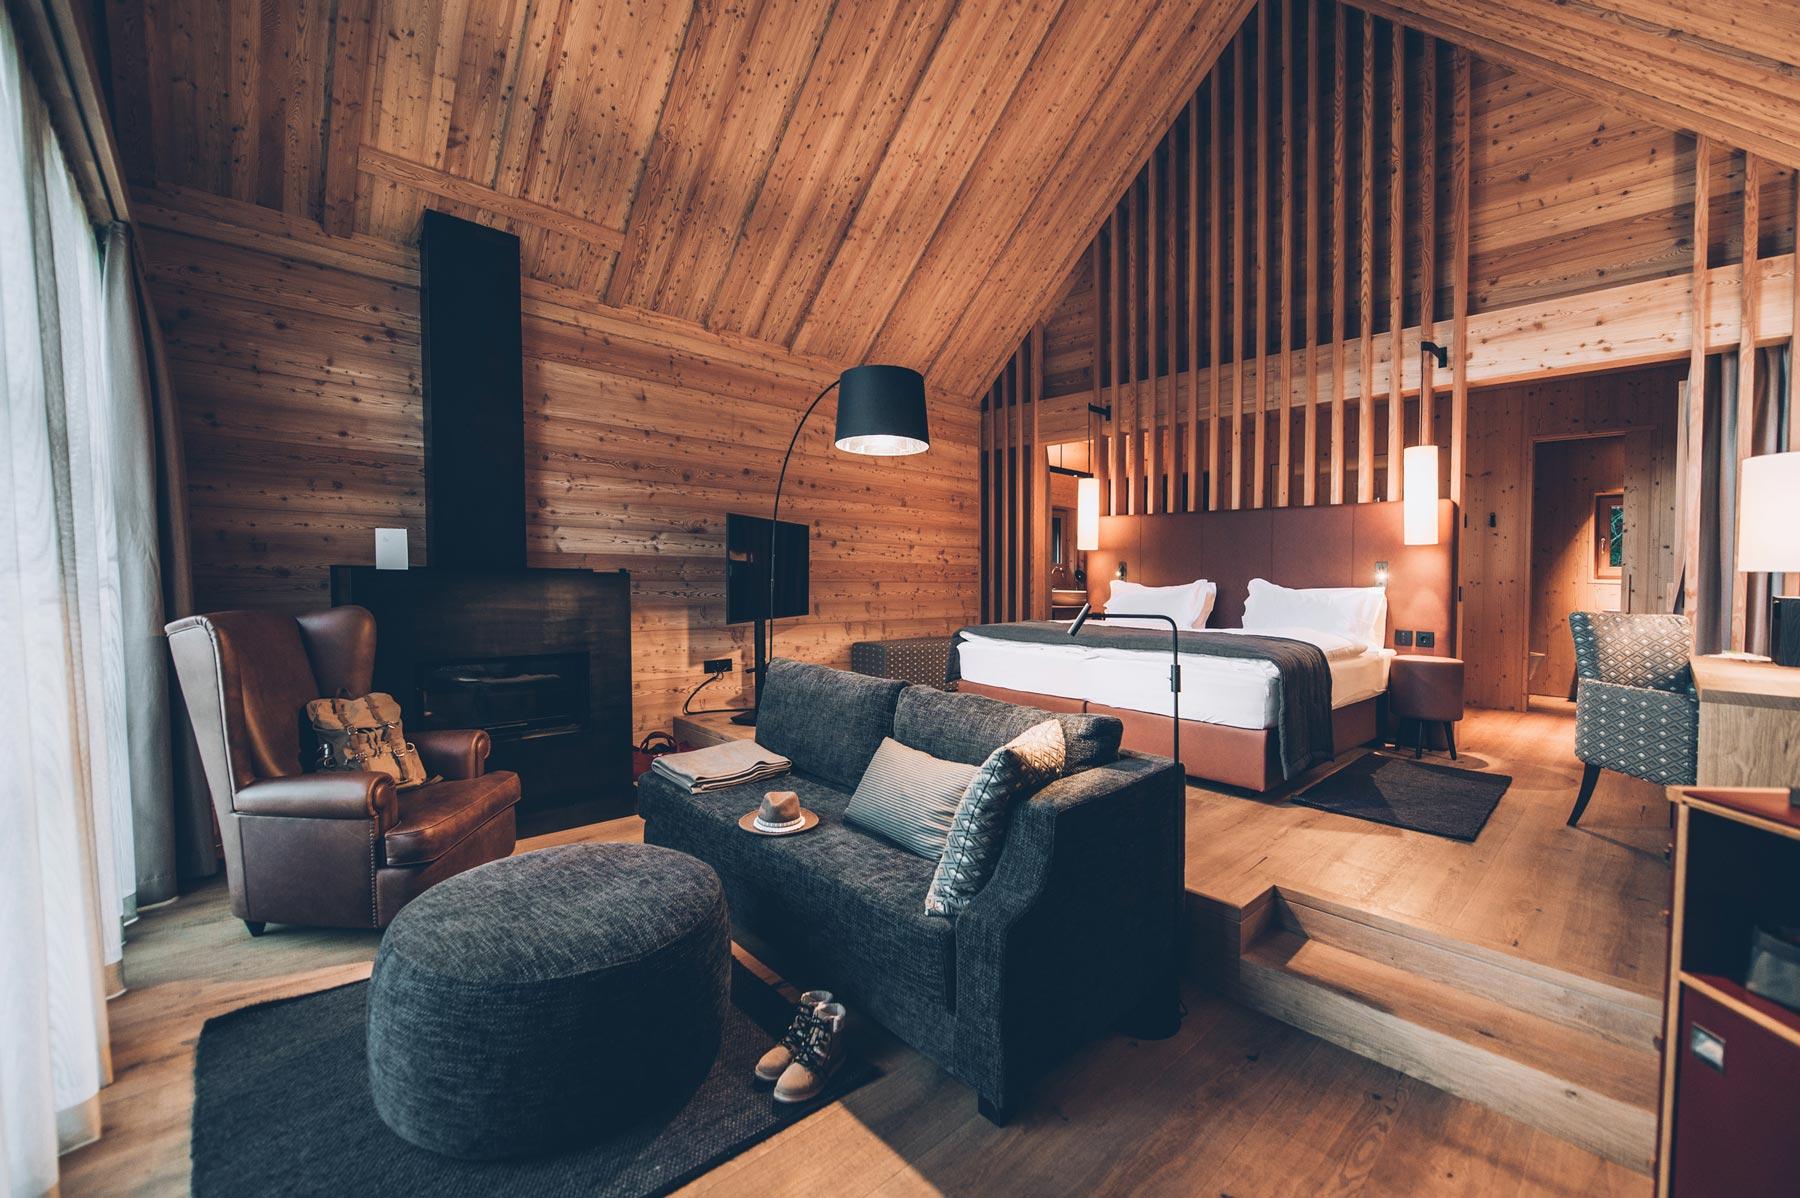 Adler Lodge Ritten, Dolomites Boutique Hotel